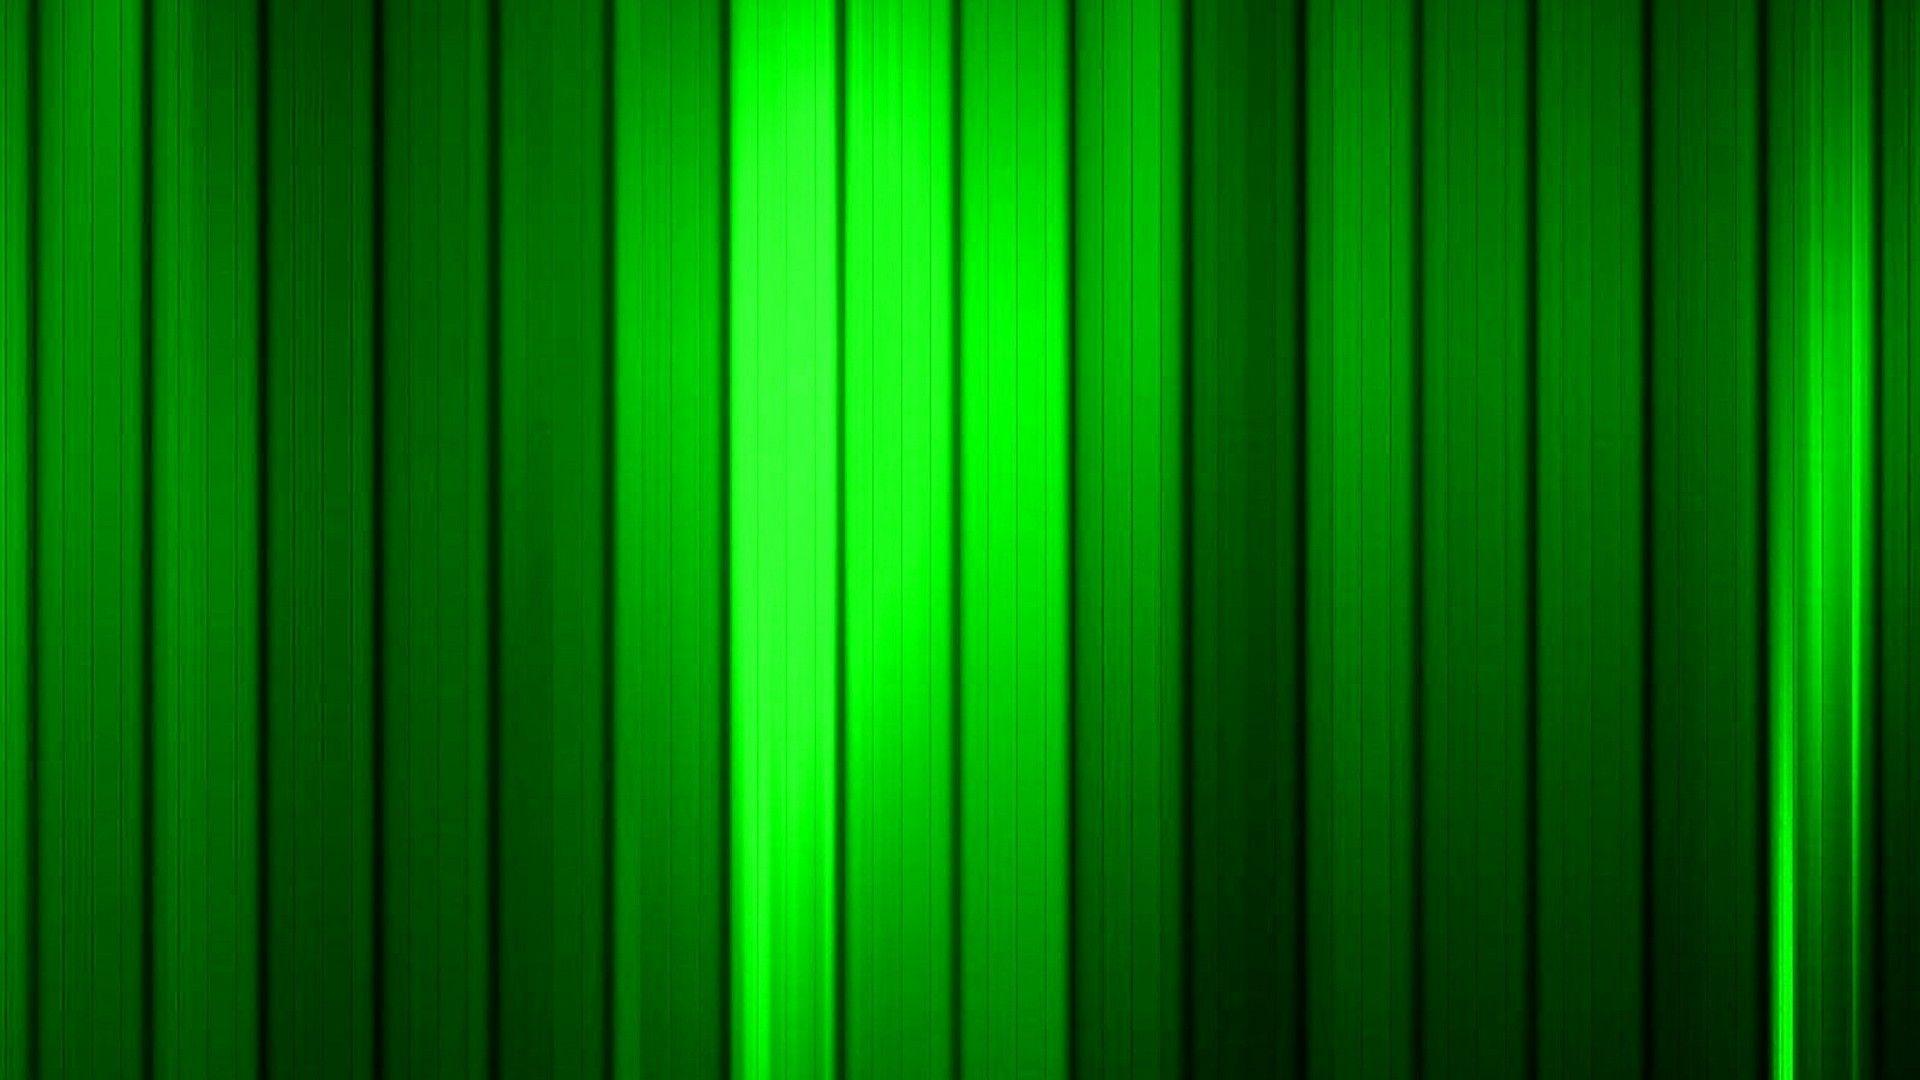 Wallpaper Green Neon Desktop   Best Wallpaper HD   Green ...